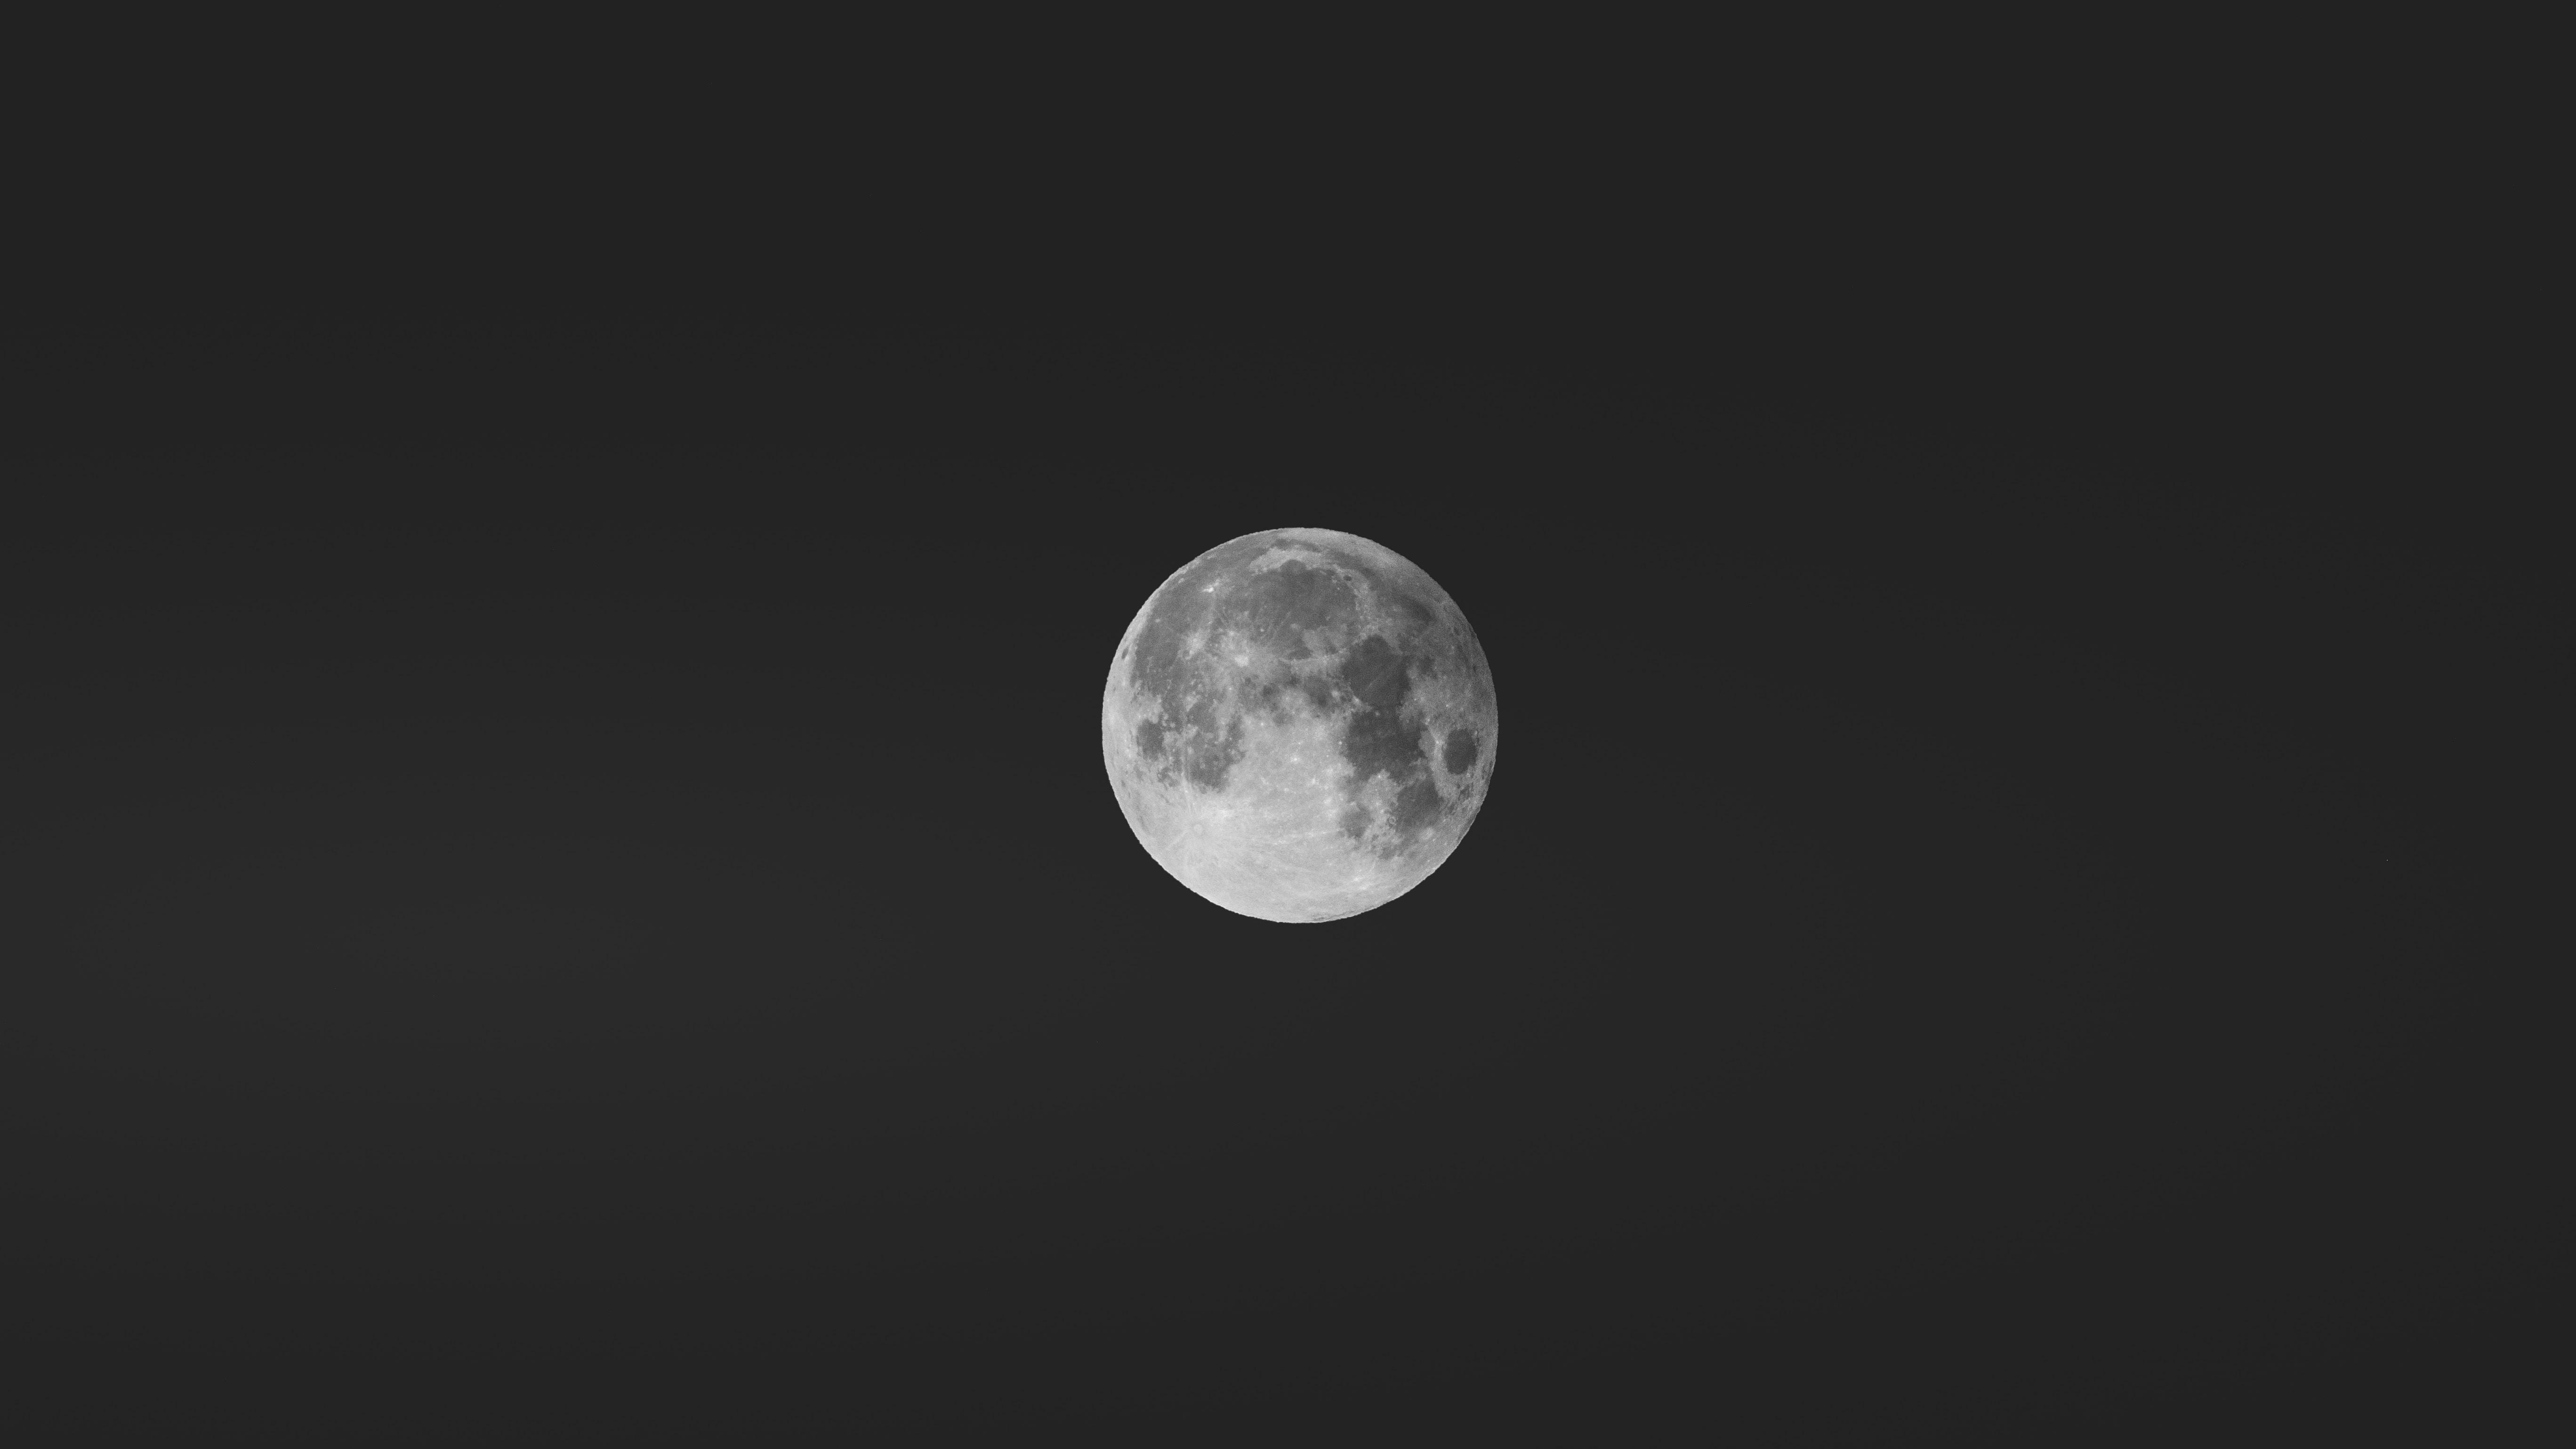 A focused shot on a full moon in a dark night sky in Innsbruck, Austria